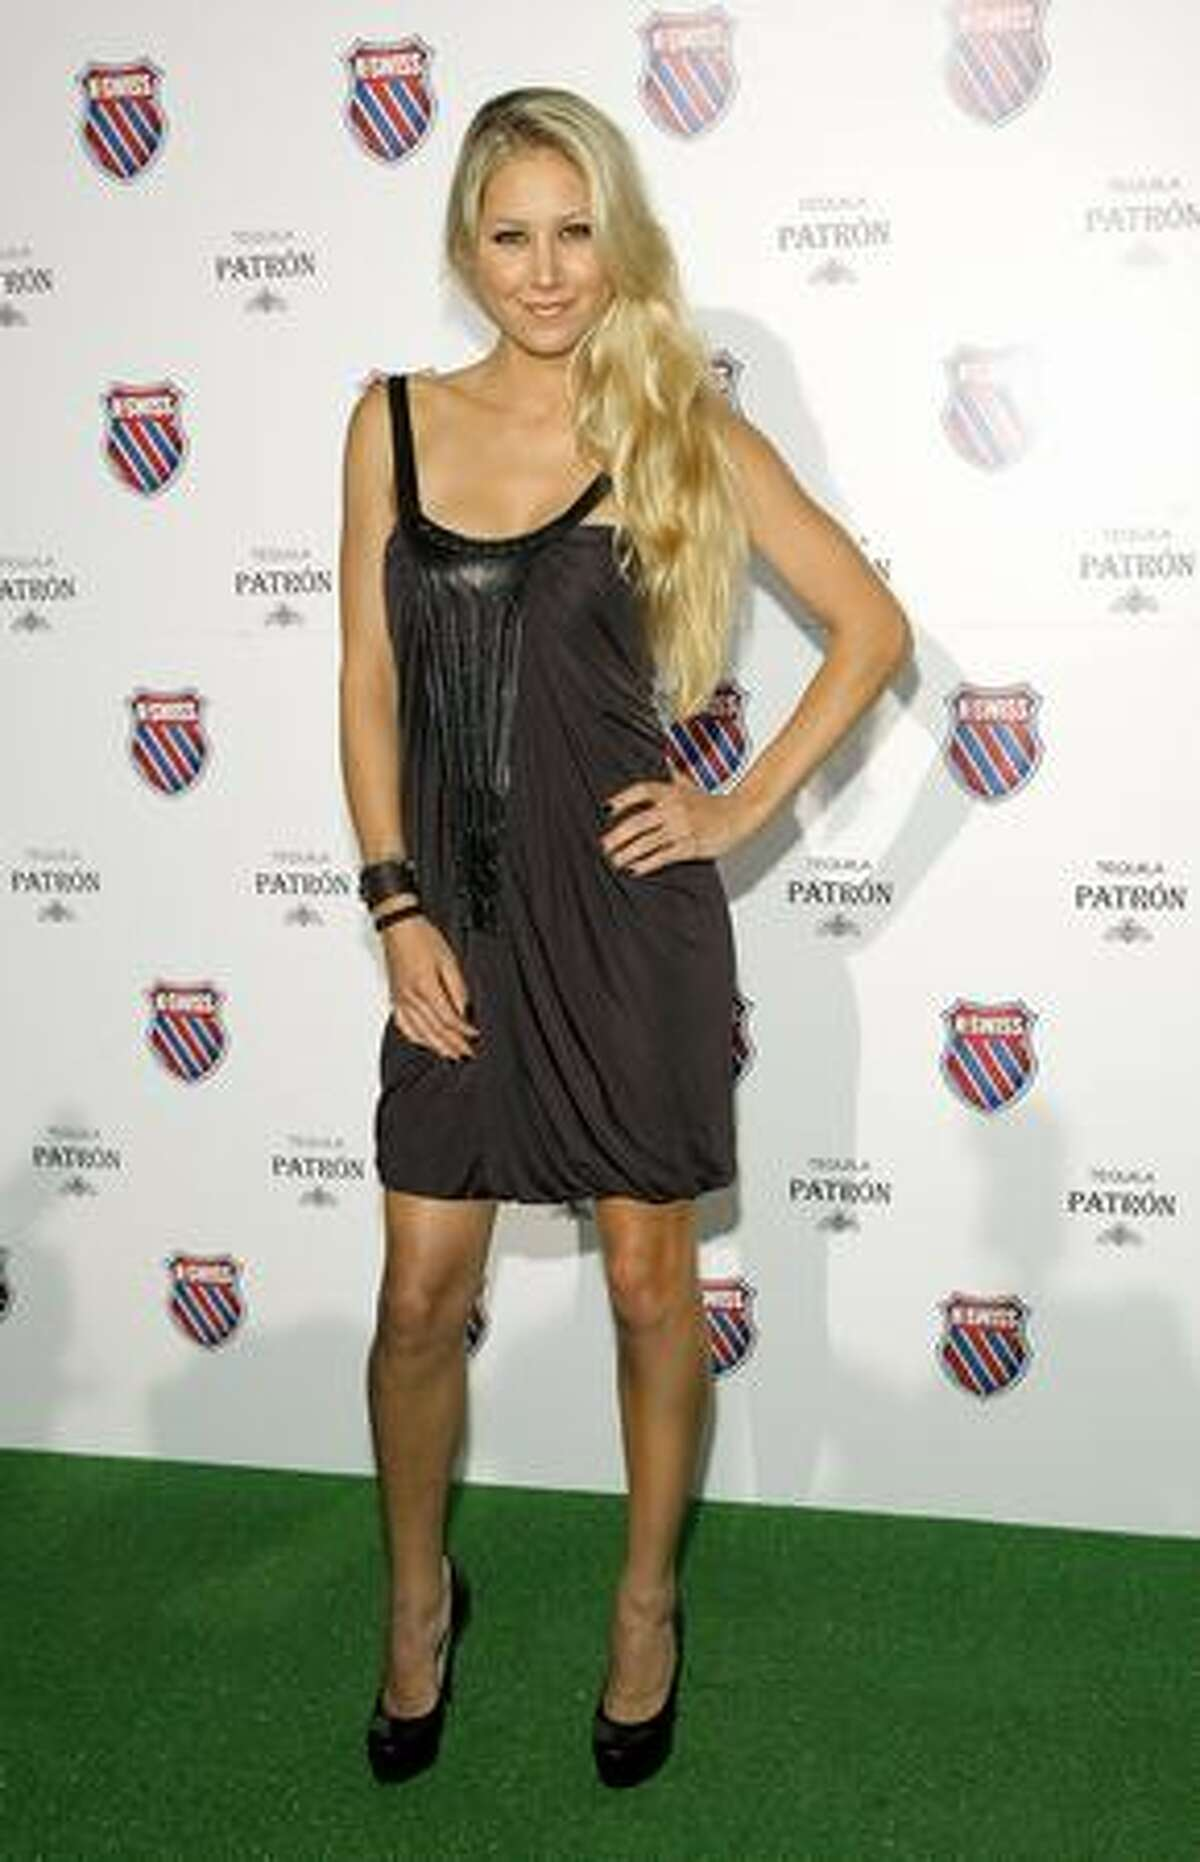 Anna Kournikova attends the